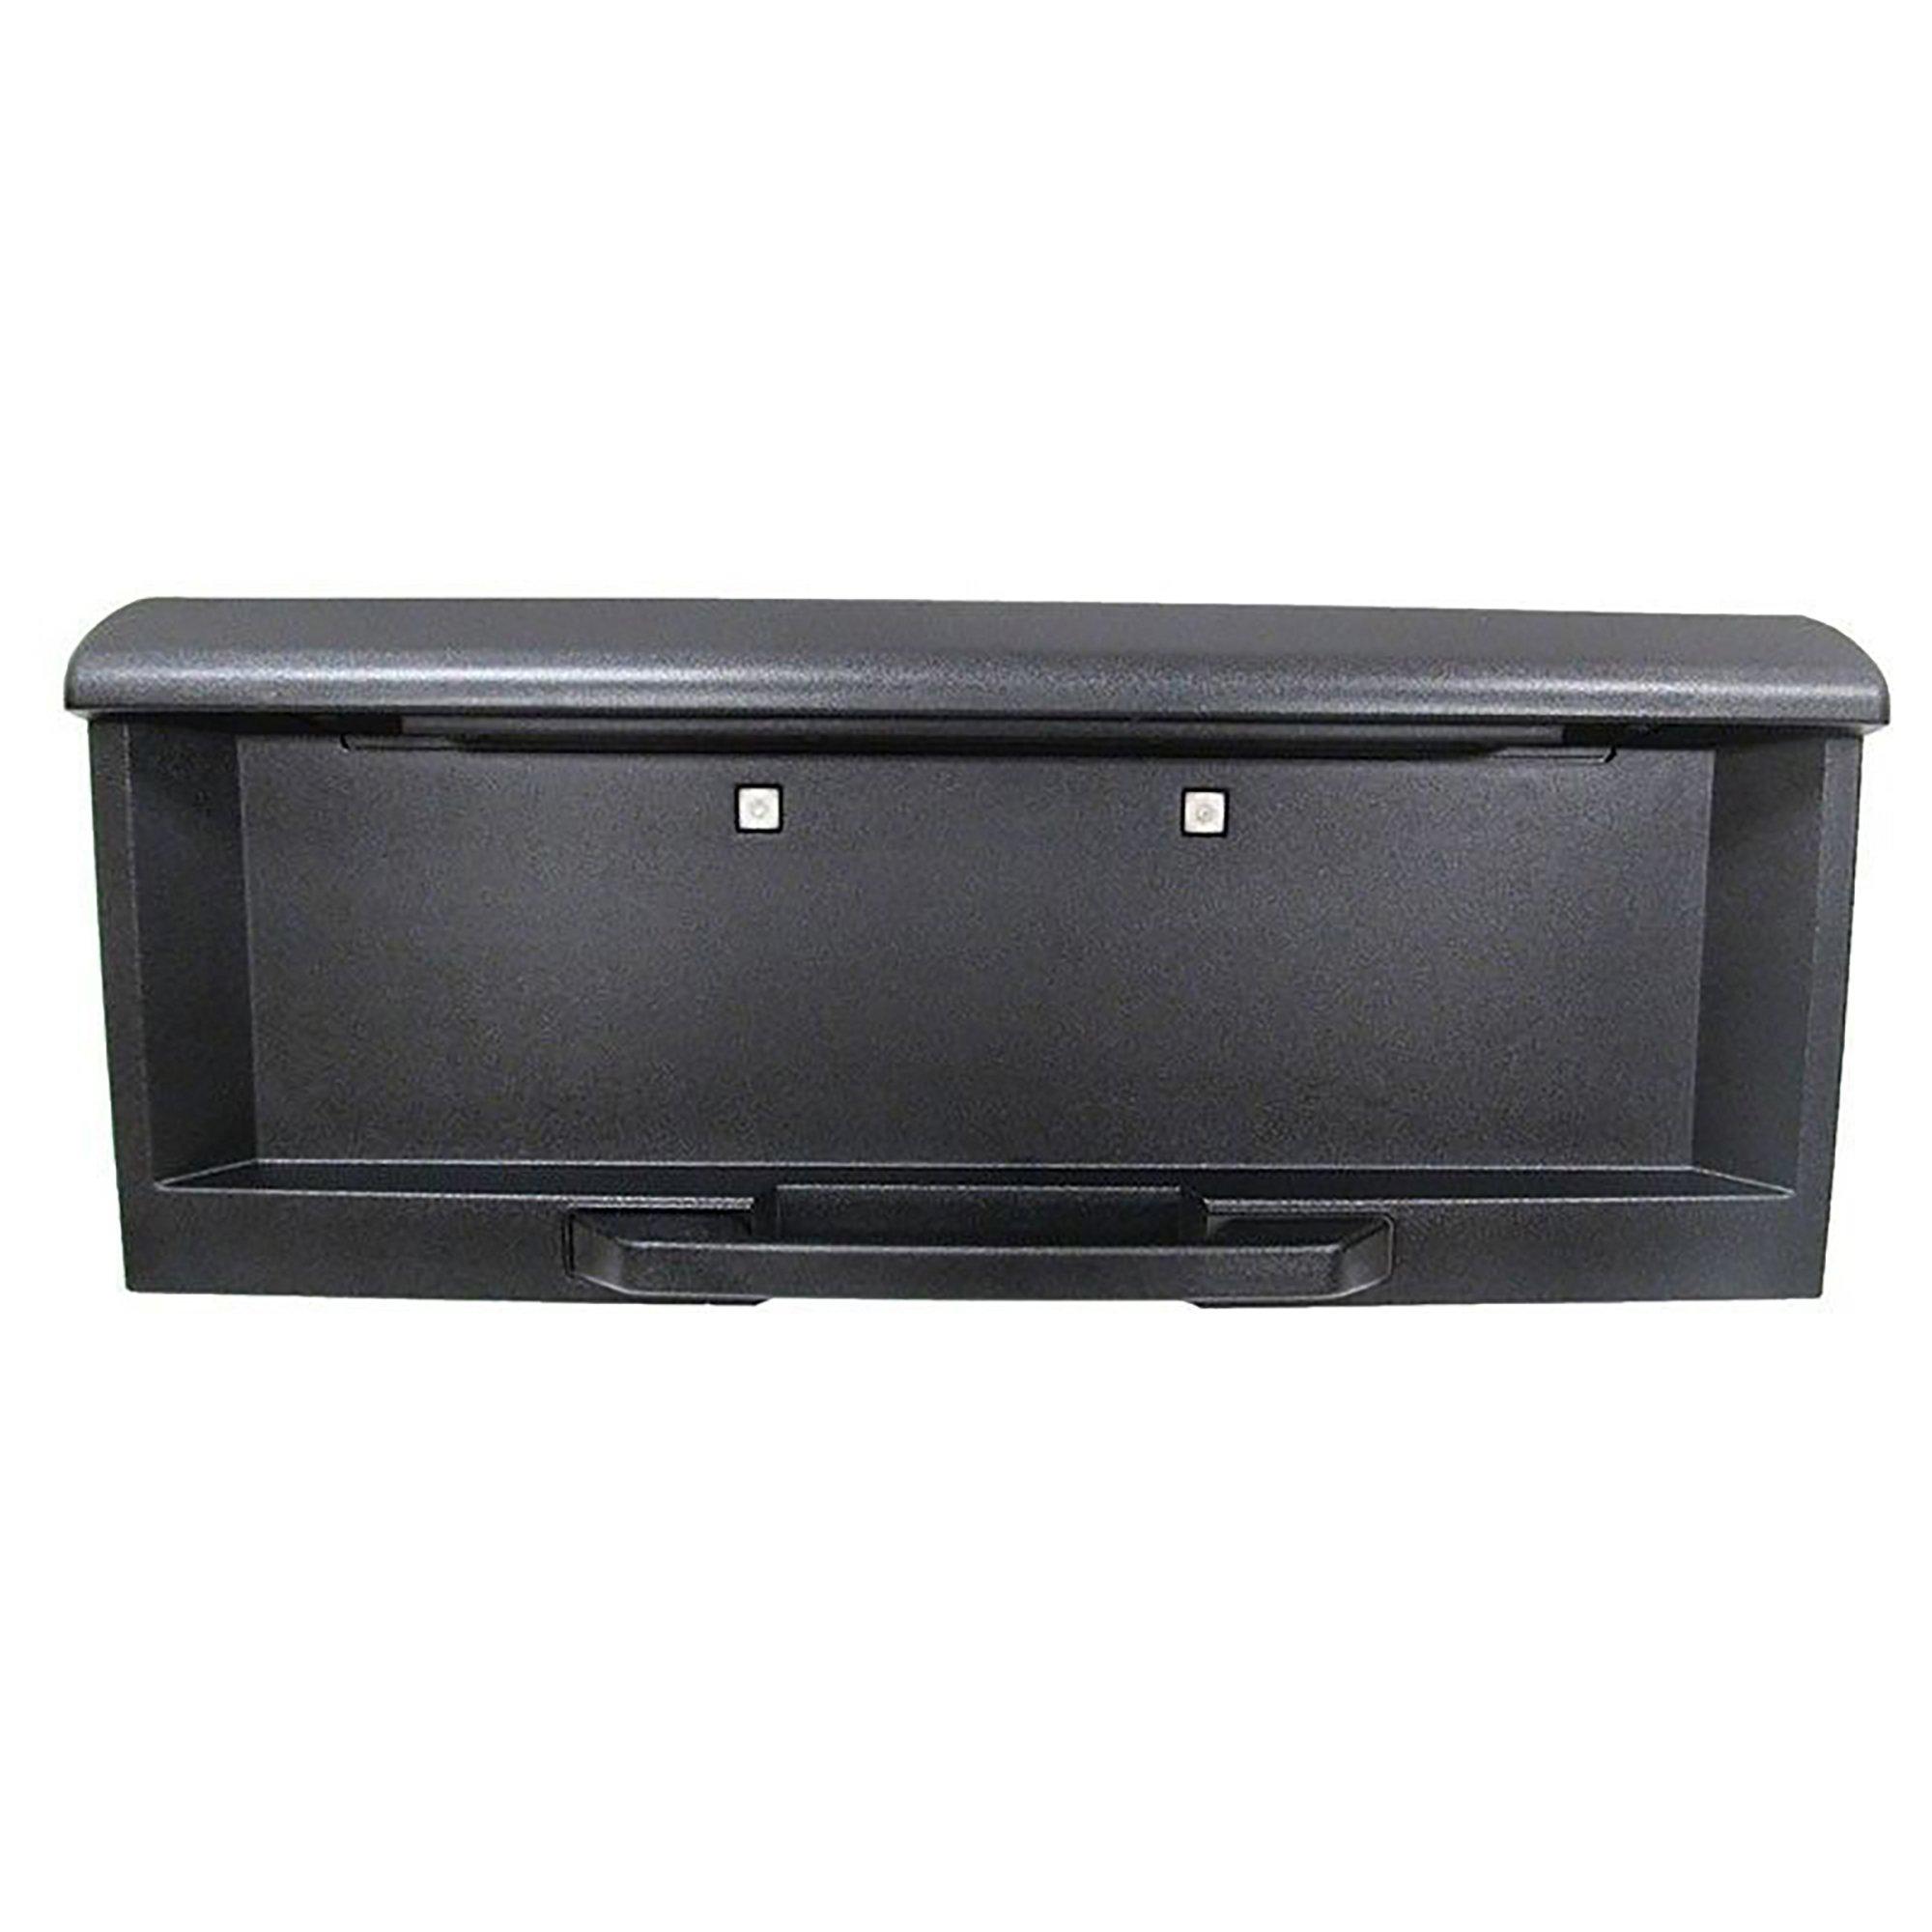 GMC OEM New Rear Liftgate License Plate Pocket Handle Panel 03-05 Hummer H2 15135441